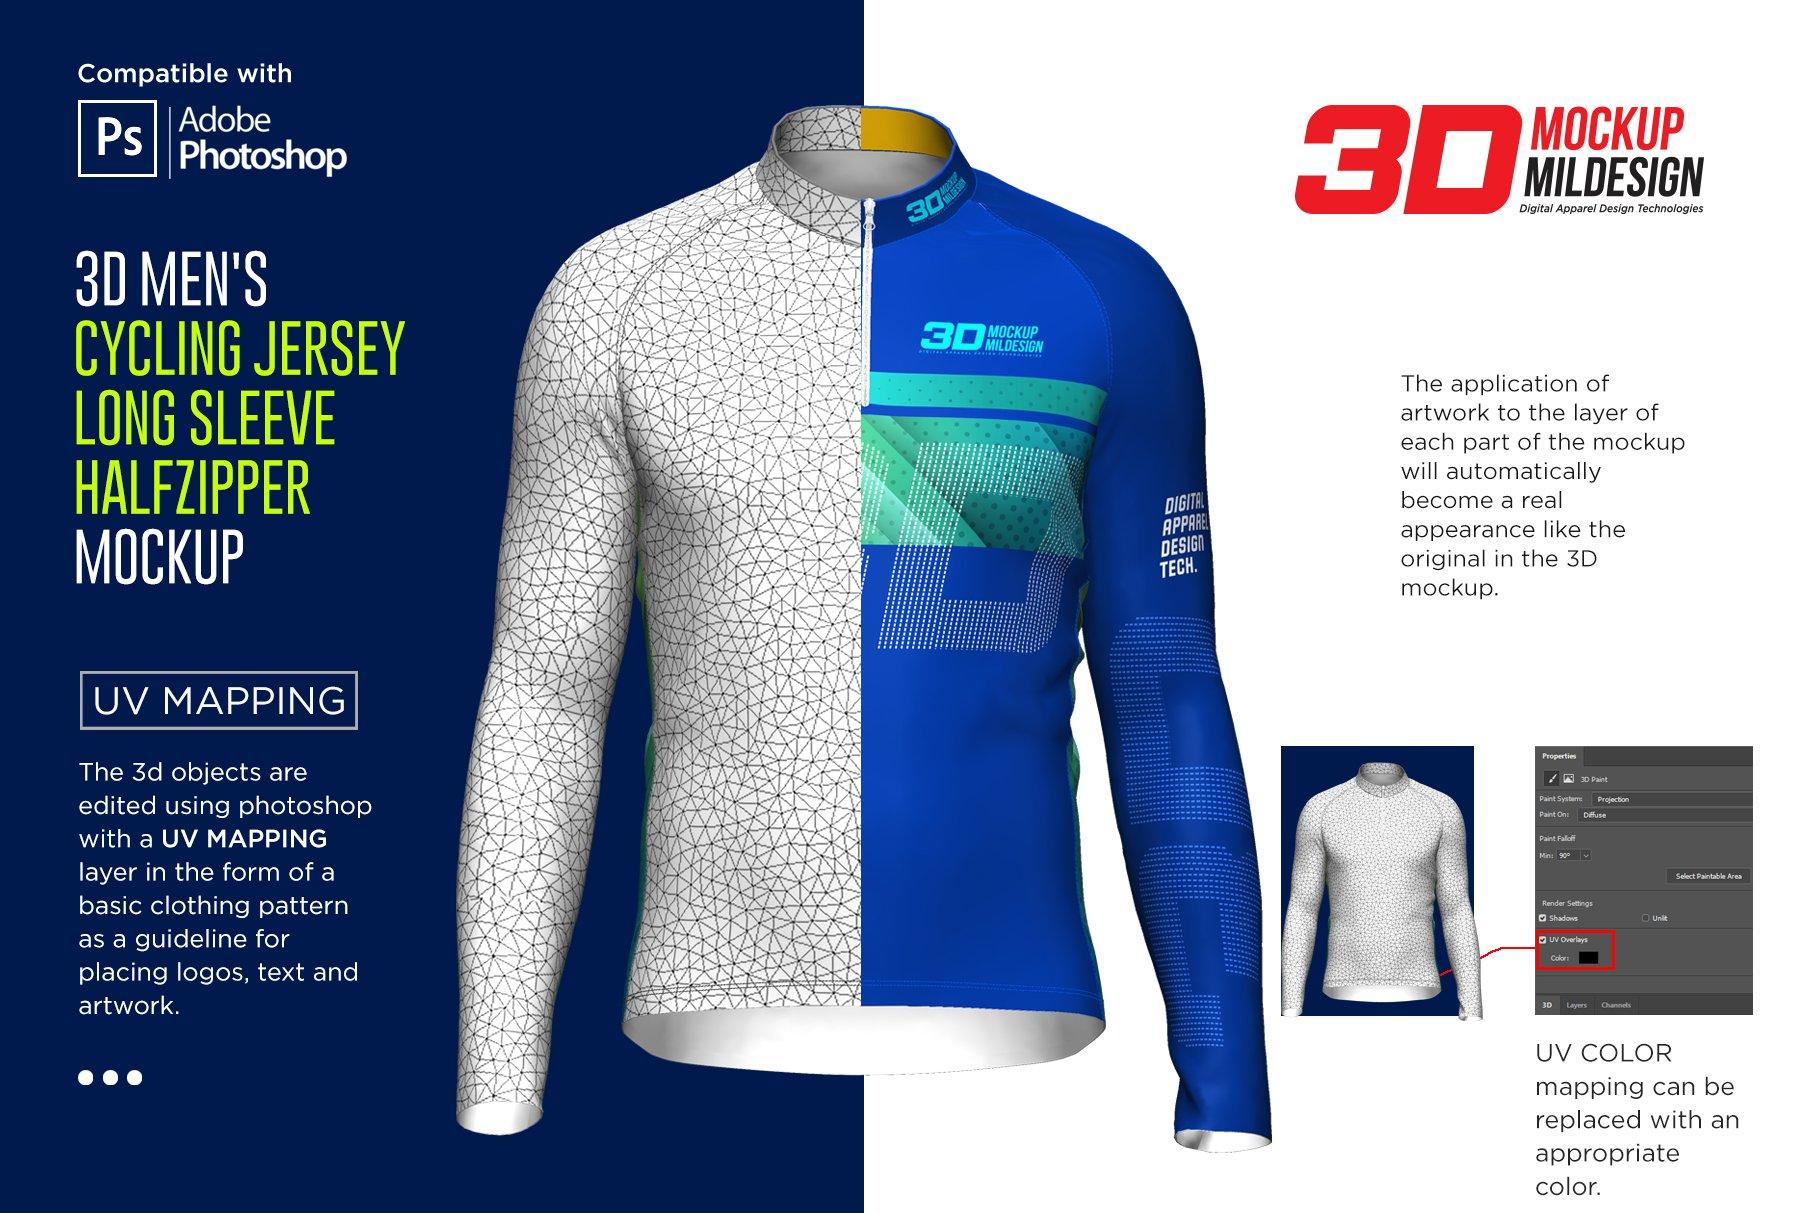 3D男士骑行服装印花图案设计展示贴图样机 3D Mens Cycling Jersey Half-zip LS插图1